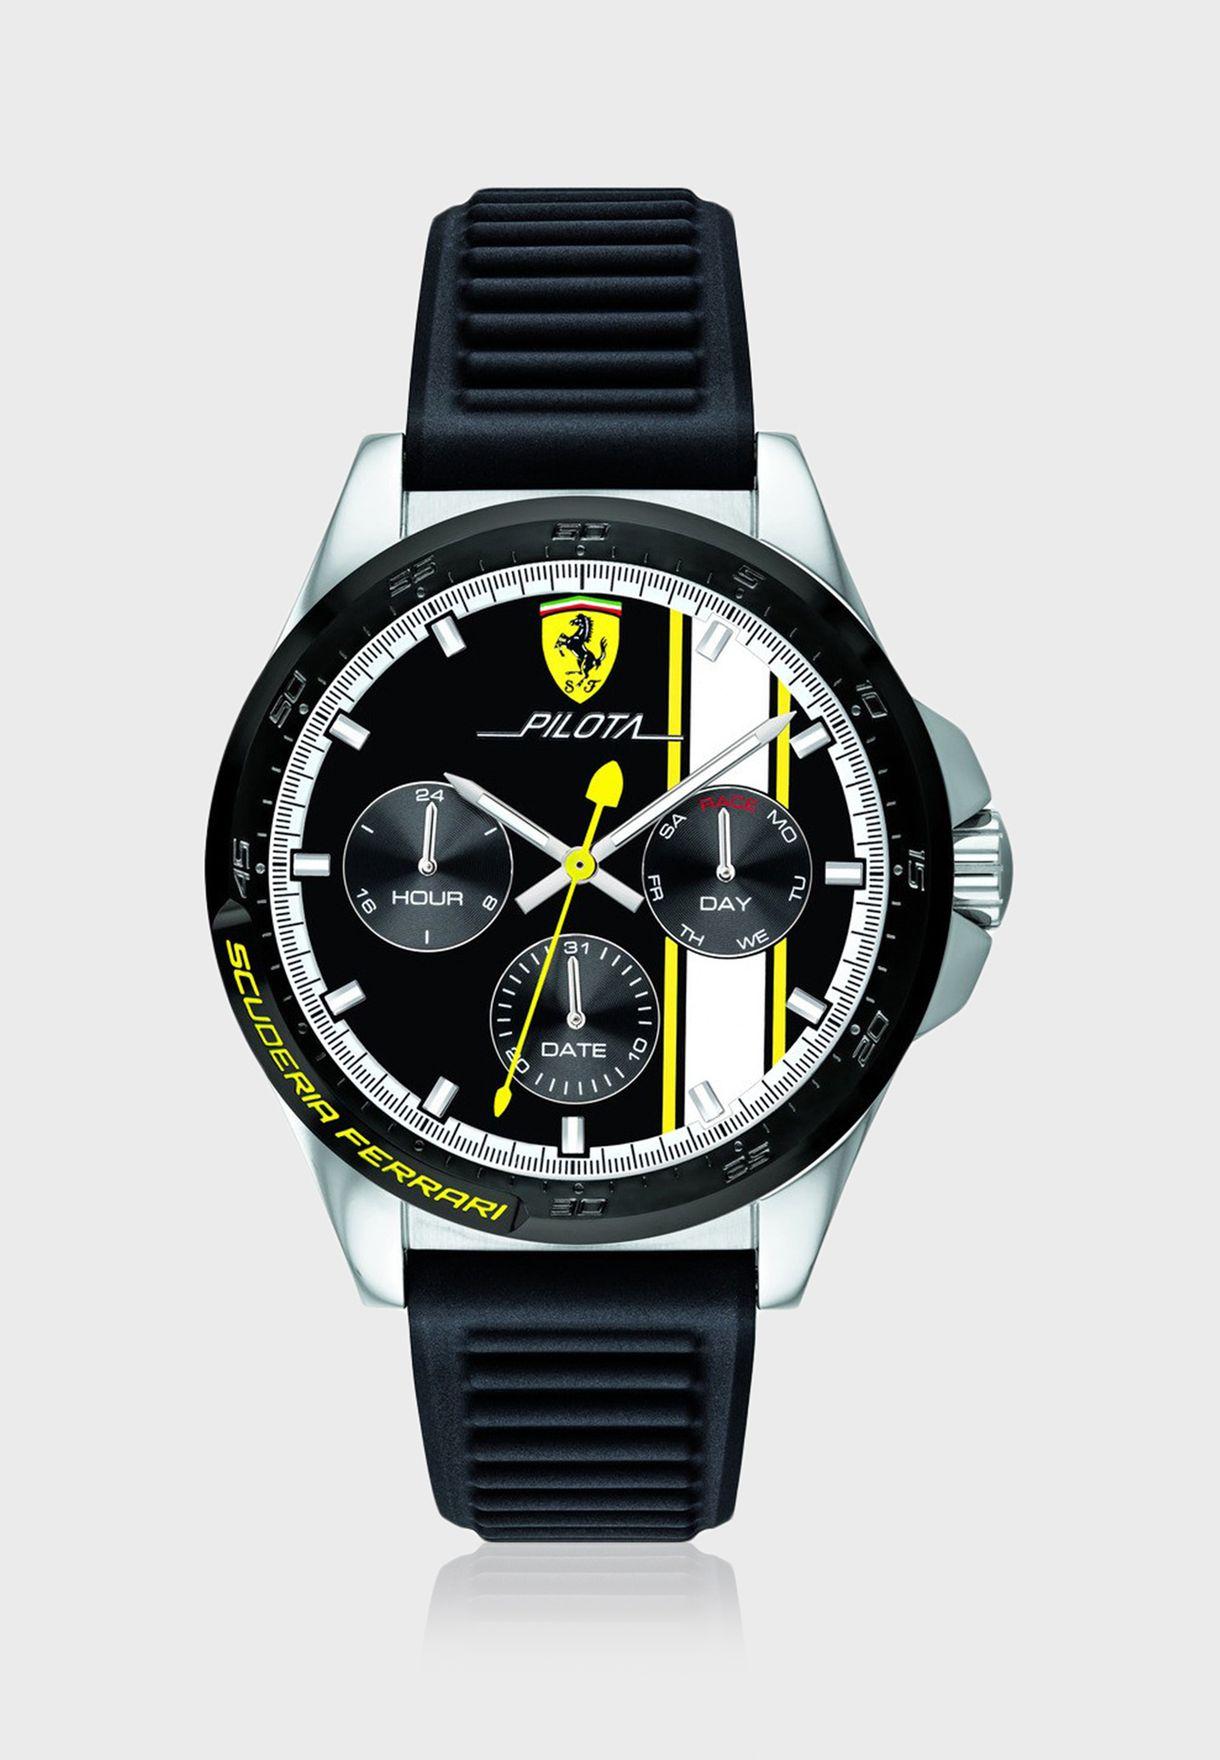 830659 Pilota Chronograph Watch